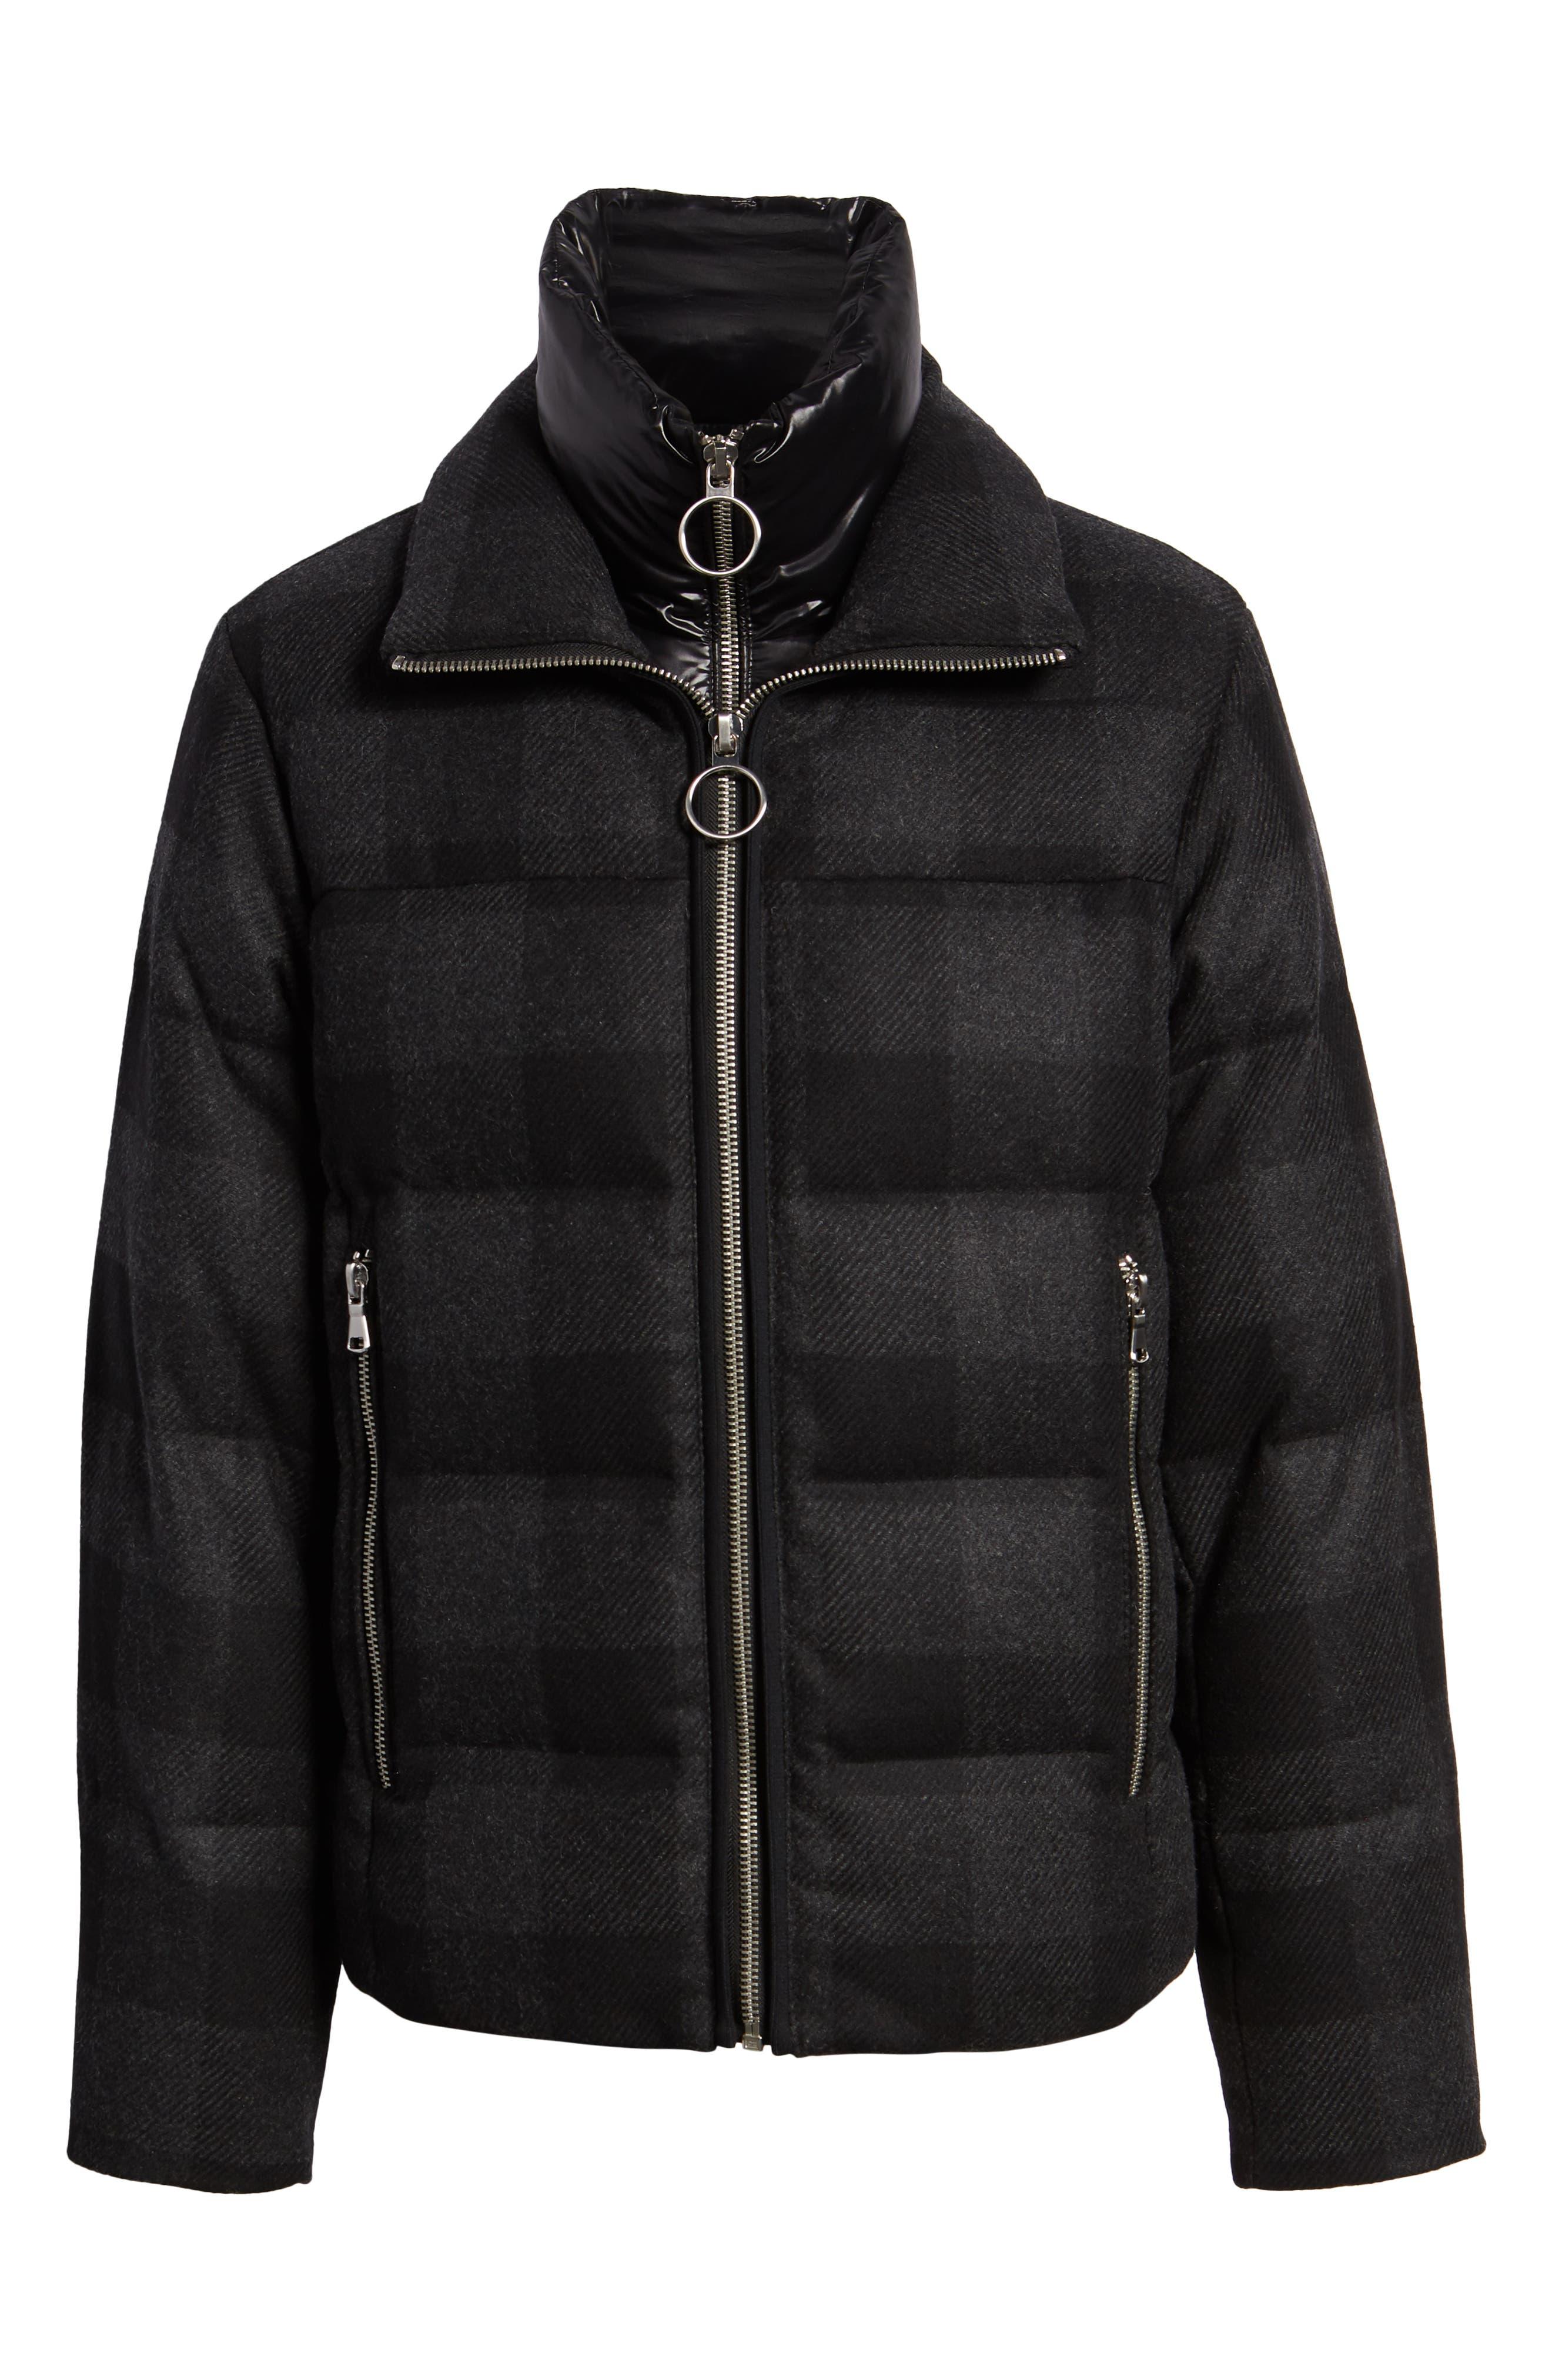 Crosby Plaid Wool Bib Puffer Jacket,                             Alternate thumbnail 5, color,                             CHARCOAL/ BLACK PLAID